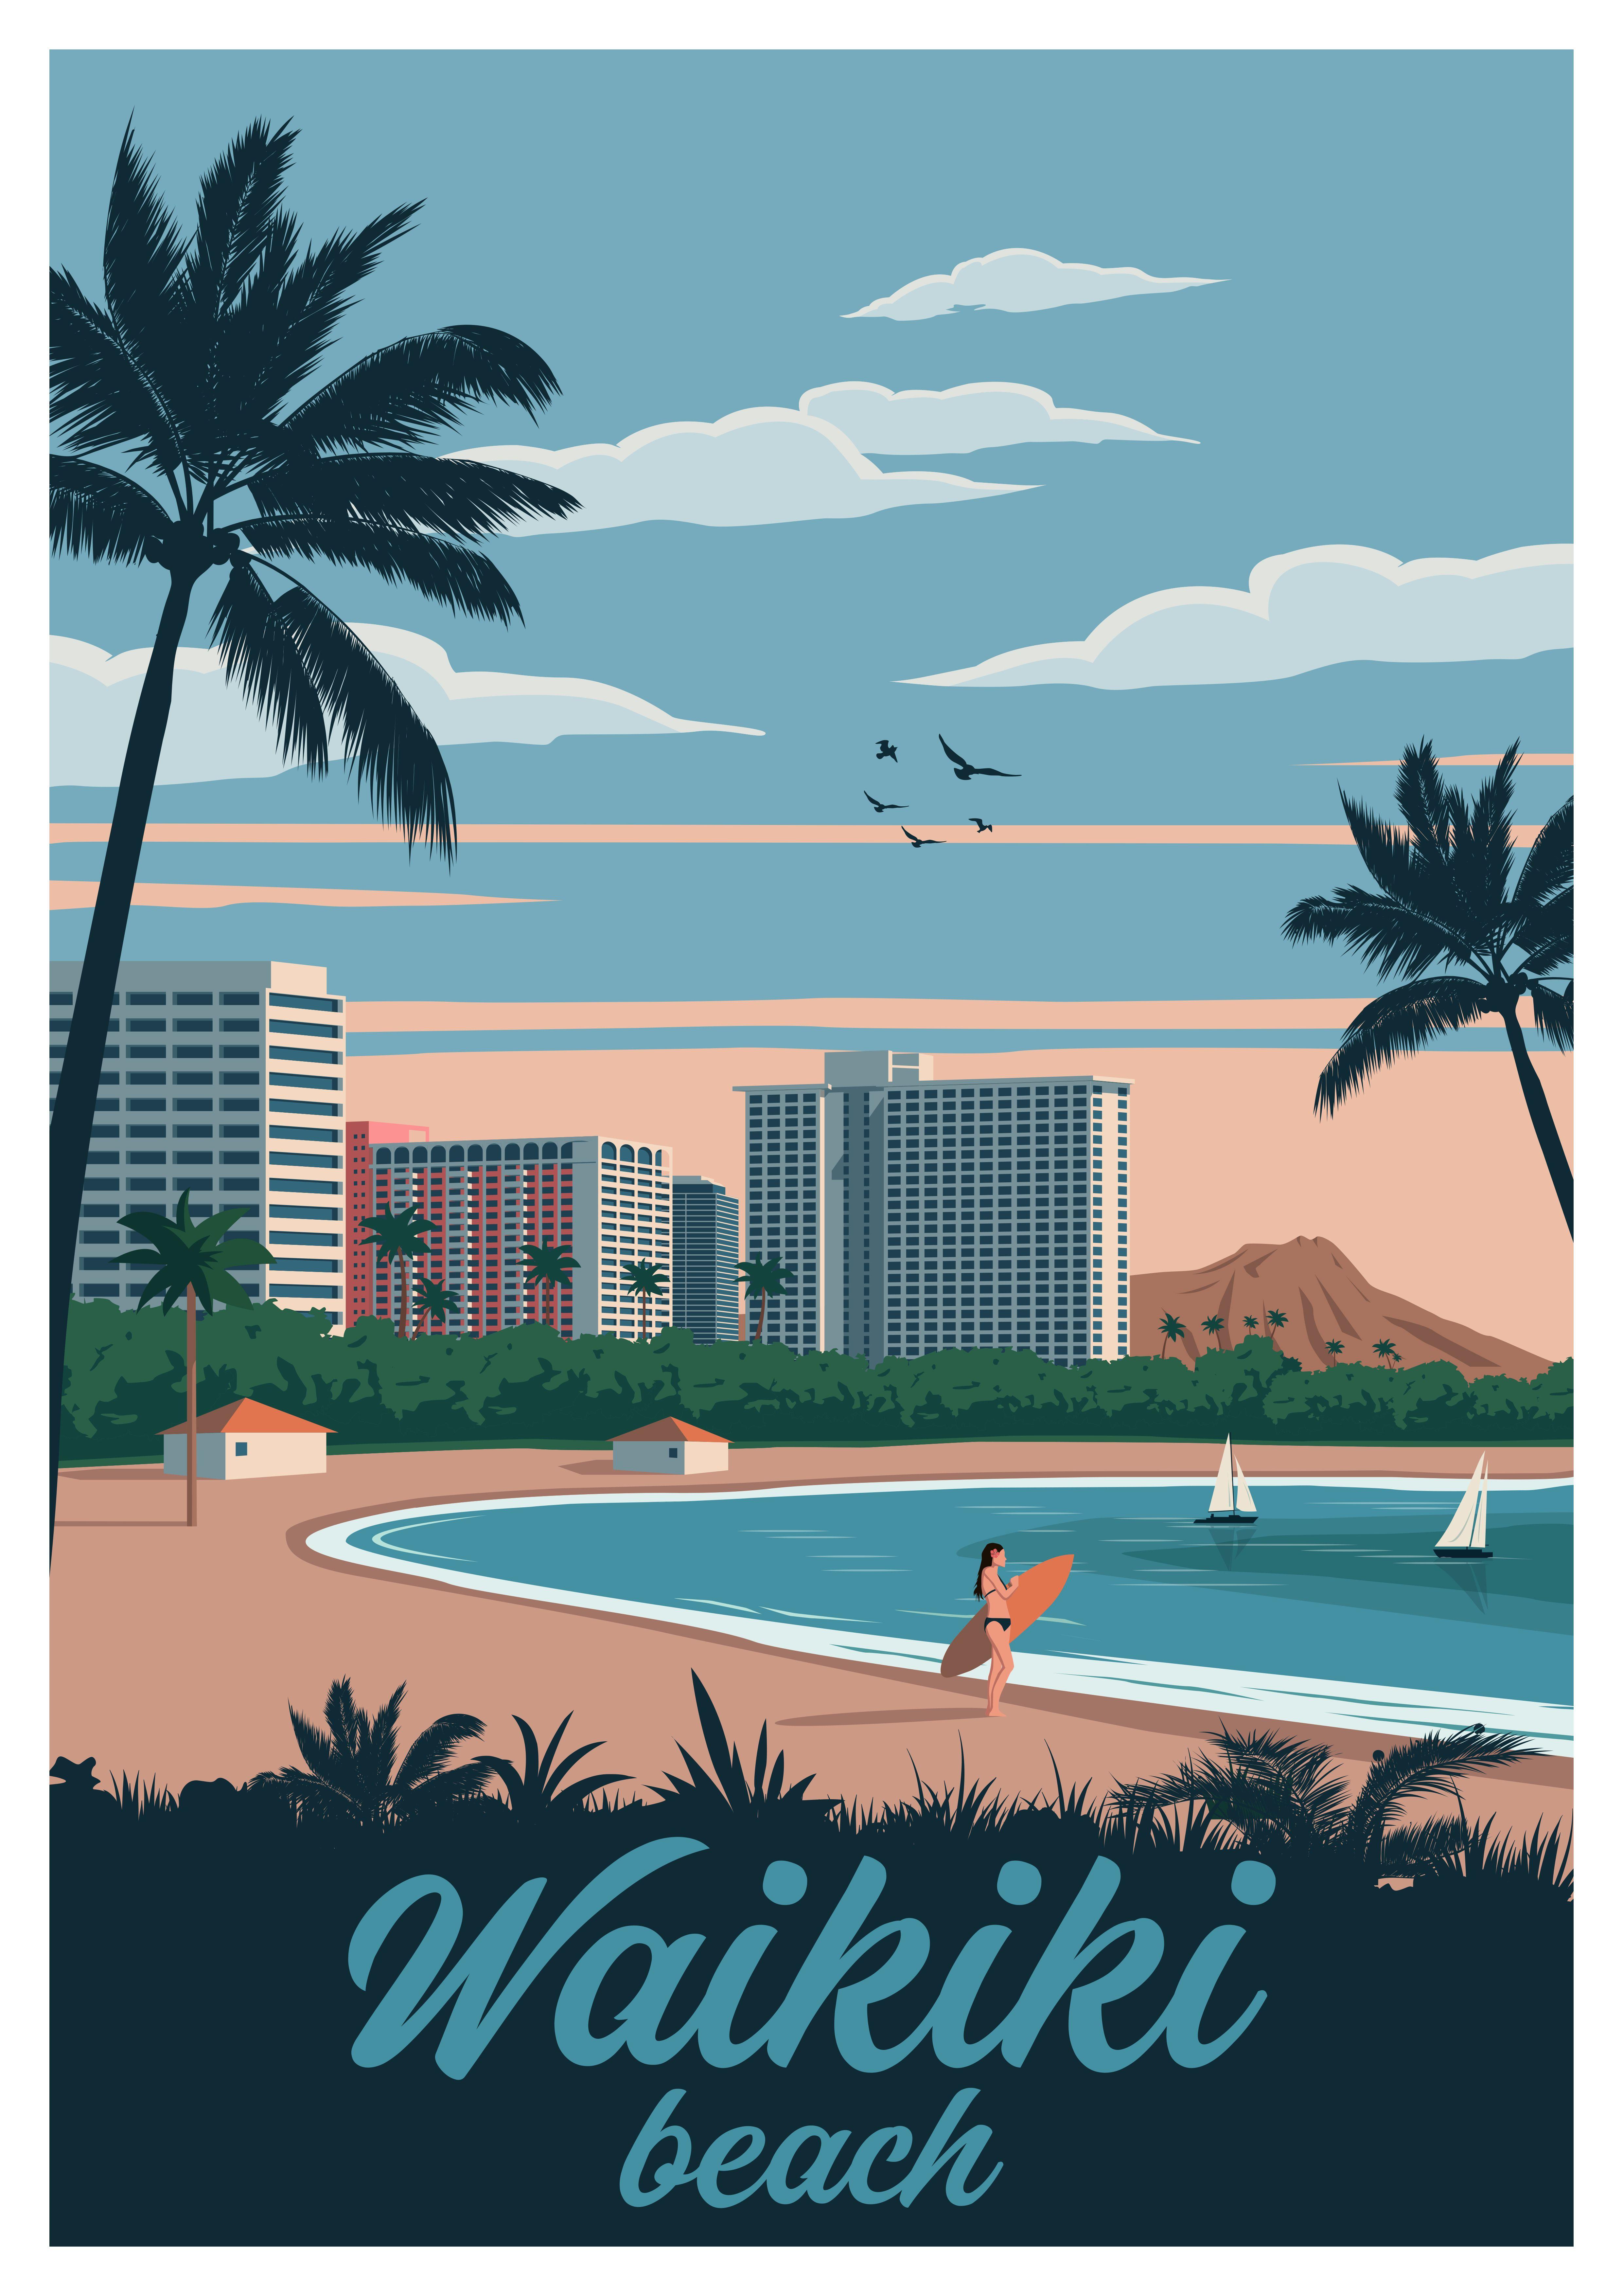 Waikiki Honolulu Hawaii Travel Poster Vintage Retro Wall Art Print Travel Posters Vintage Travel Posters Poster Vintage Retro